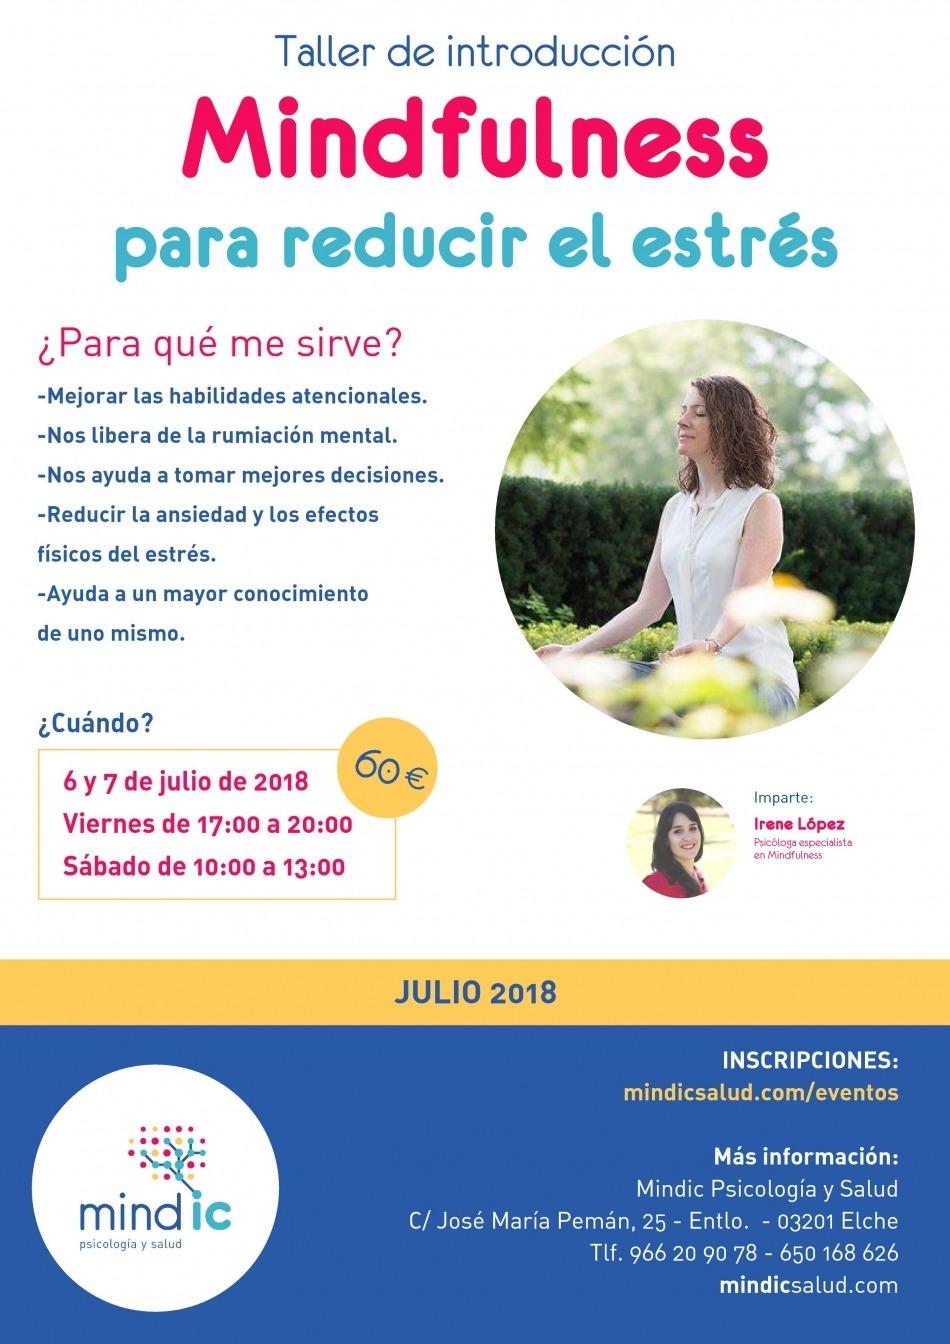 Introducción al Mindfulness para reducir el estrés